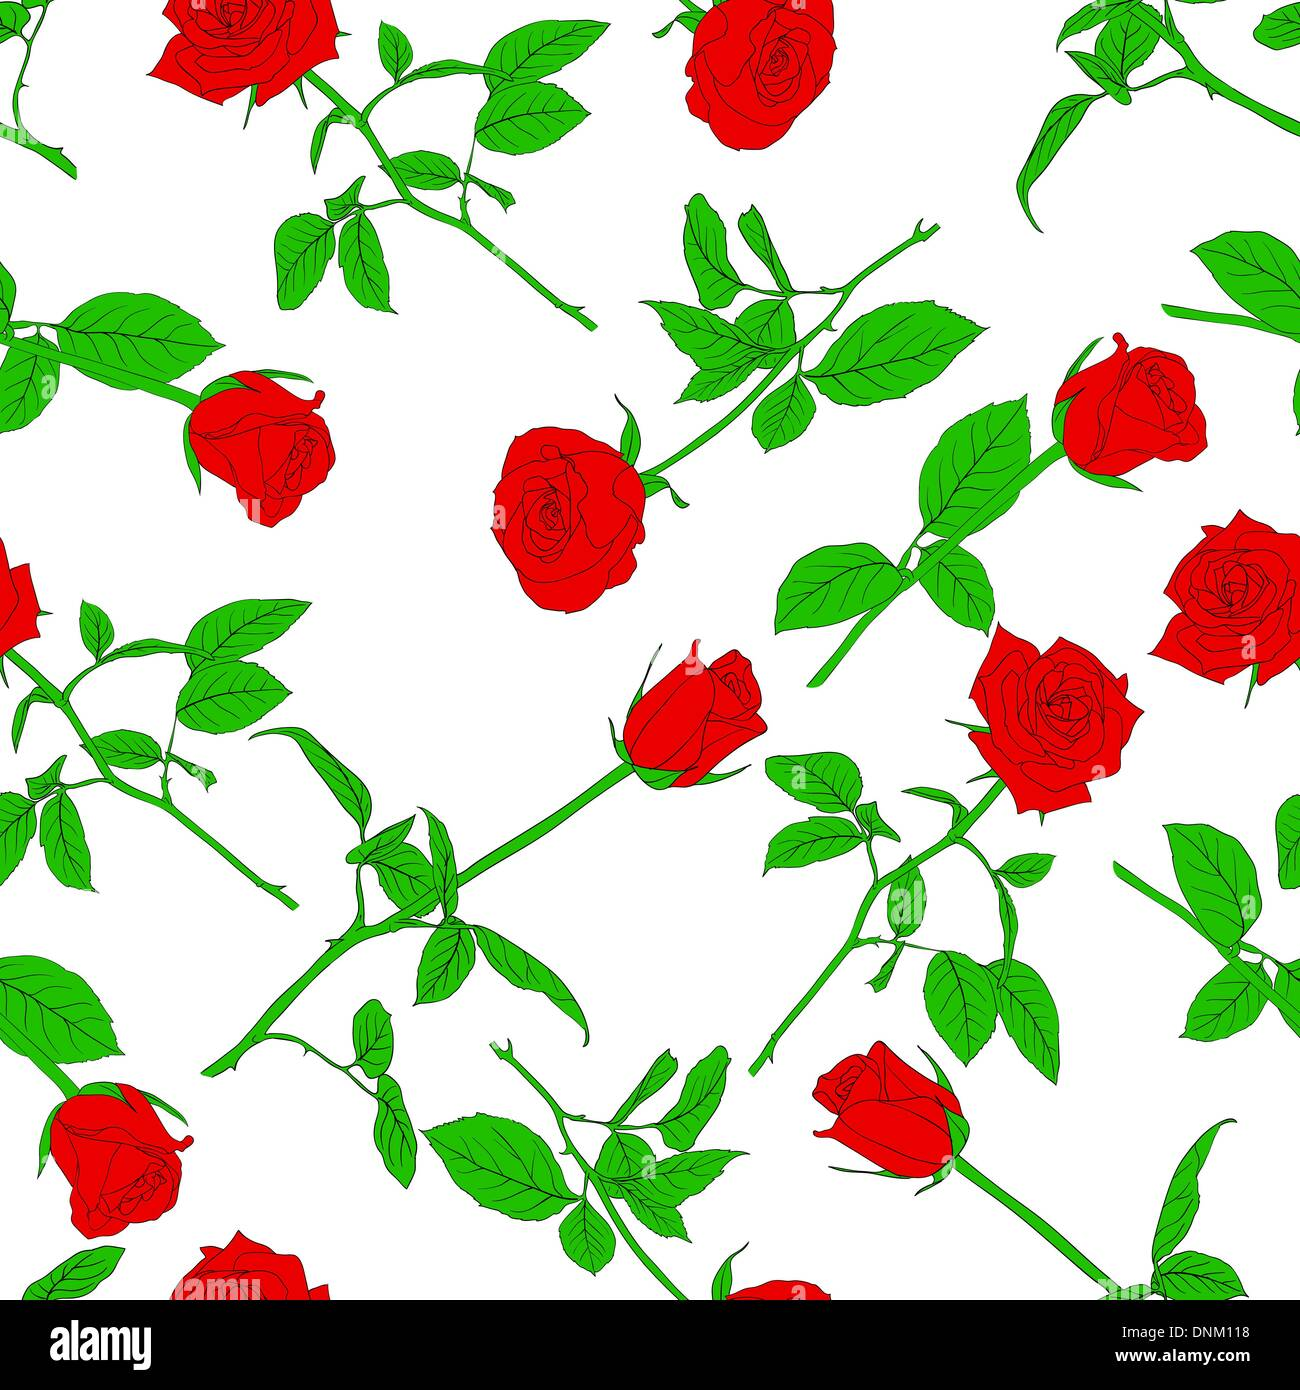 Antecedentes perfecta con rosas. Podría utilizarse como papel tapiz sin fisuras, textiles, papel de embalaje o fondo Imagen De Stock